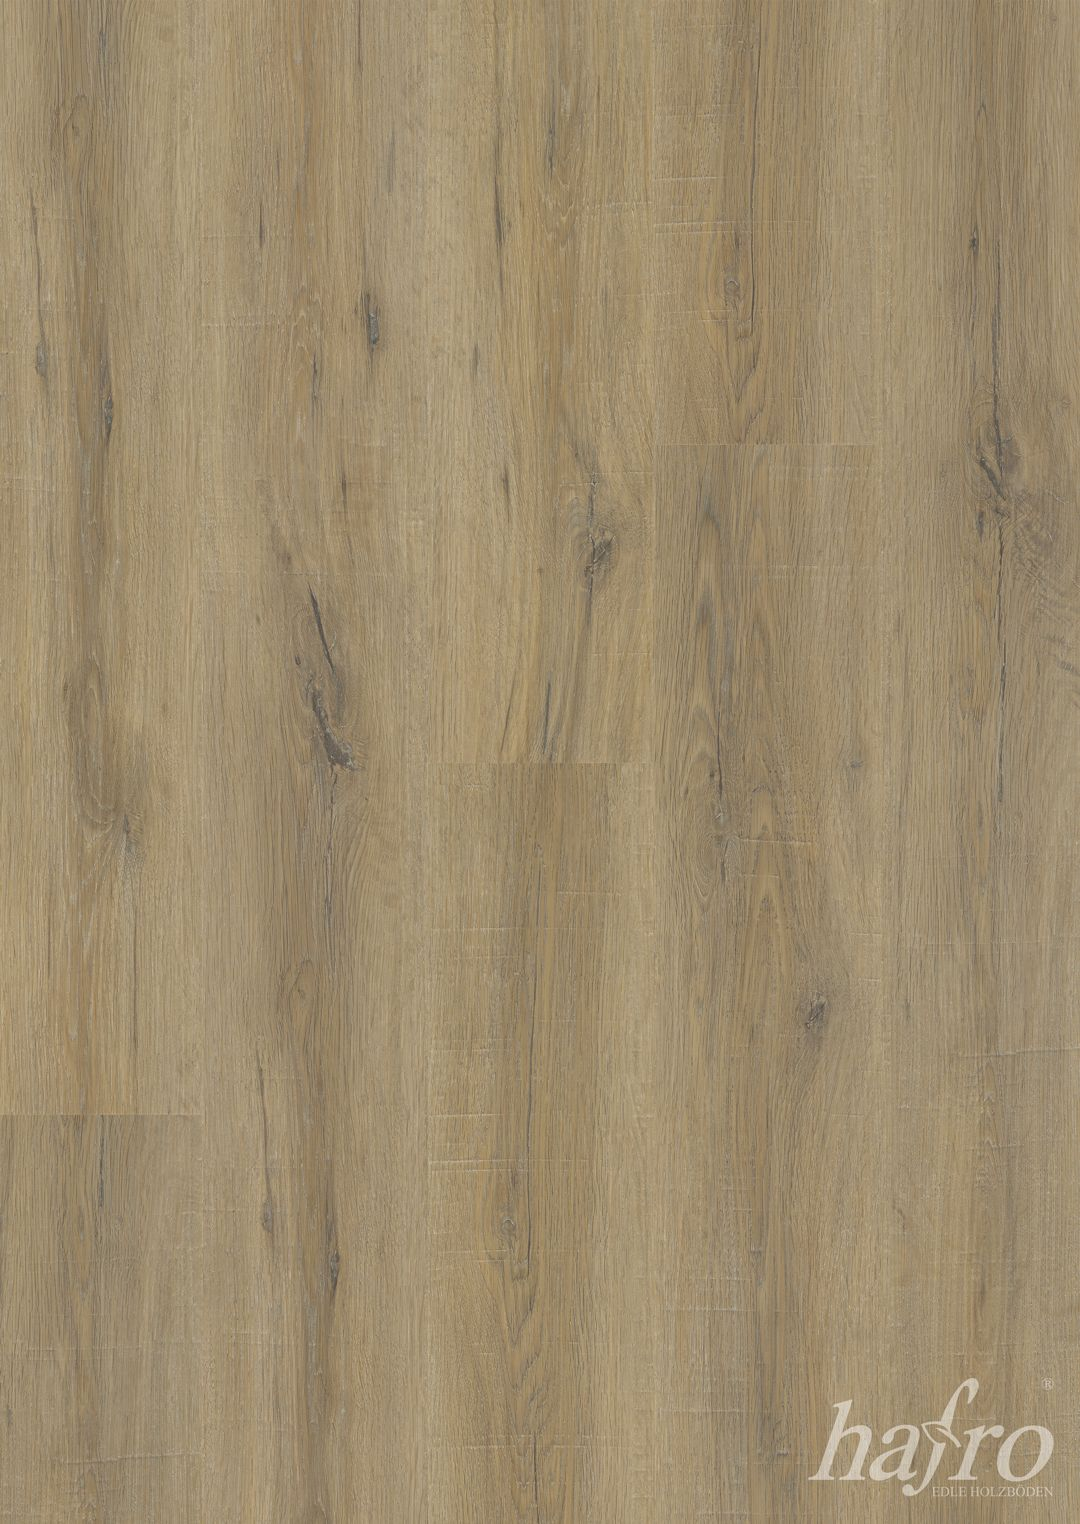 Eiche Polar Vinyl Holz Eiche